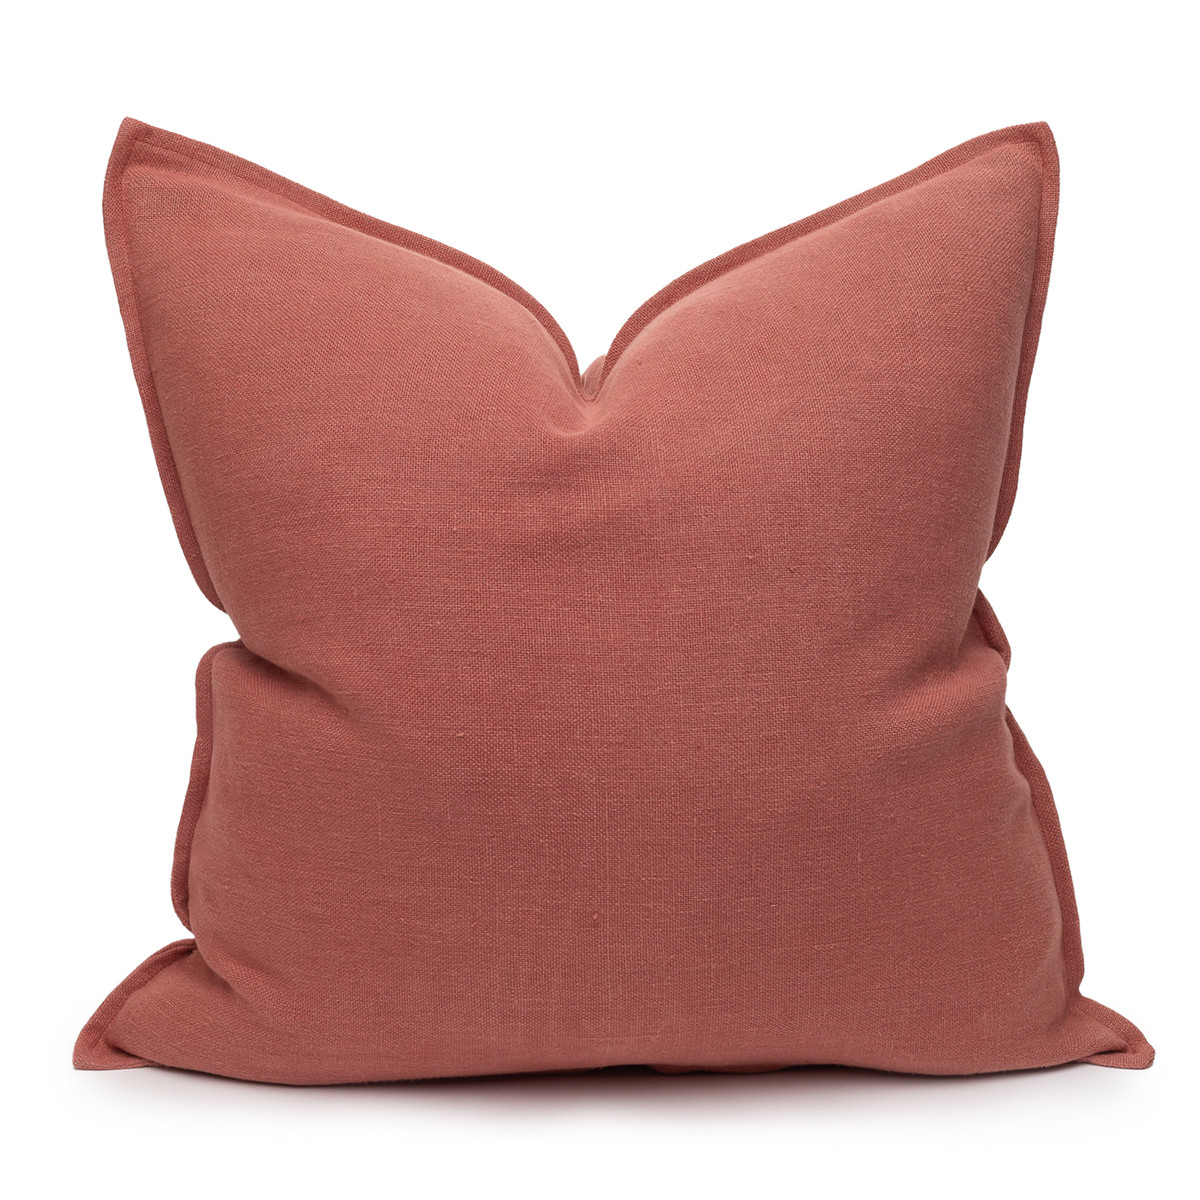 Simone PURE LINEN Pillow Terra Cotta - front